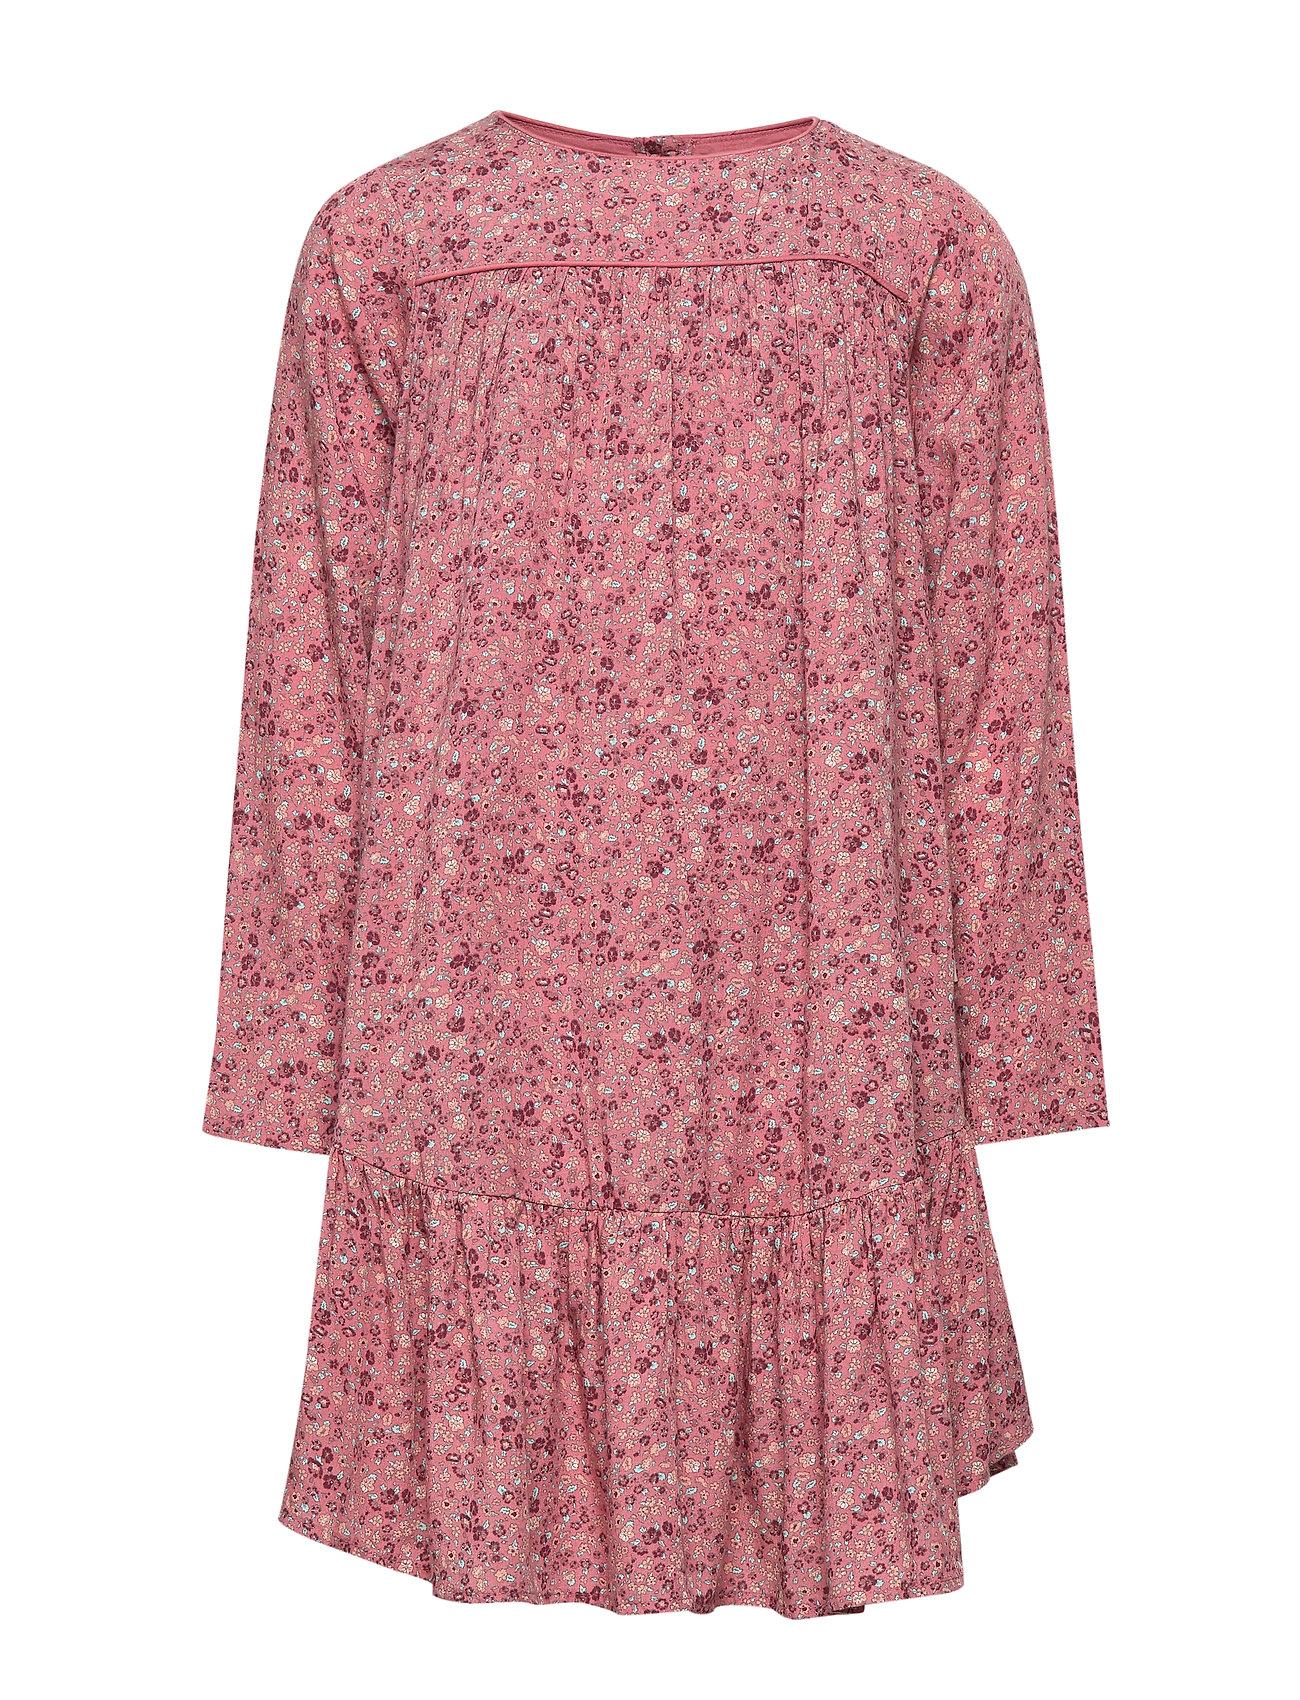 Wheat Dress Alisa - PEACH ROSE